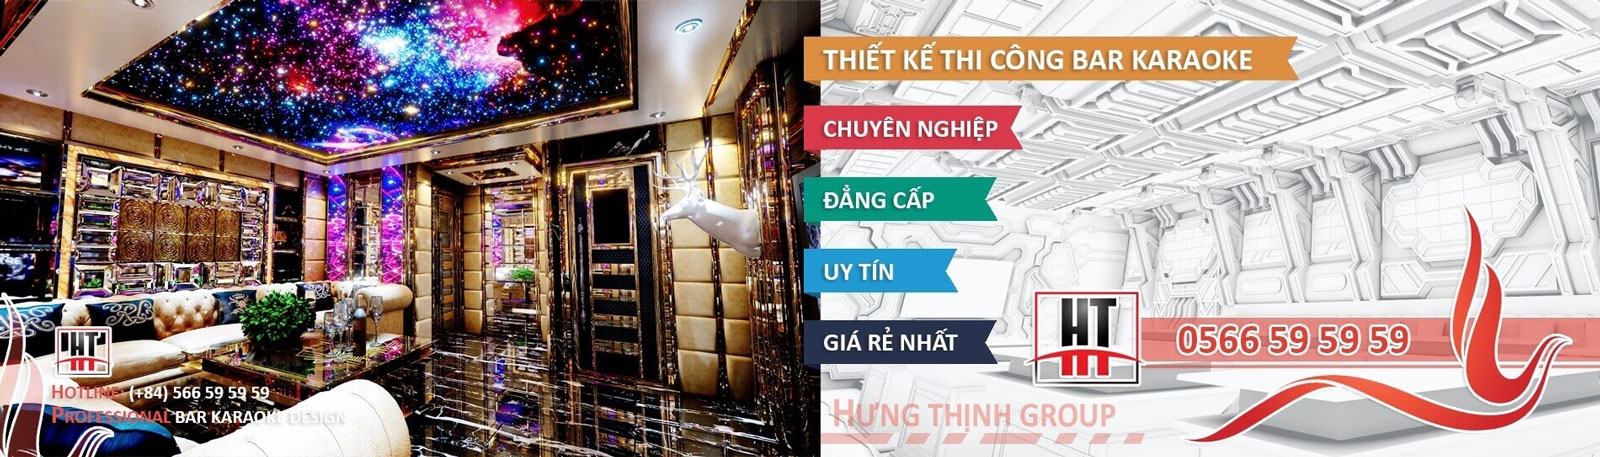 Nội Thất Karaoke (@thietkephongkaraoke) Cover Image